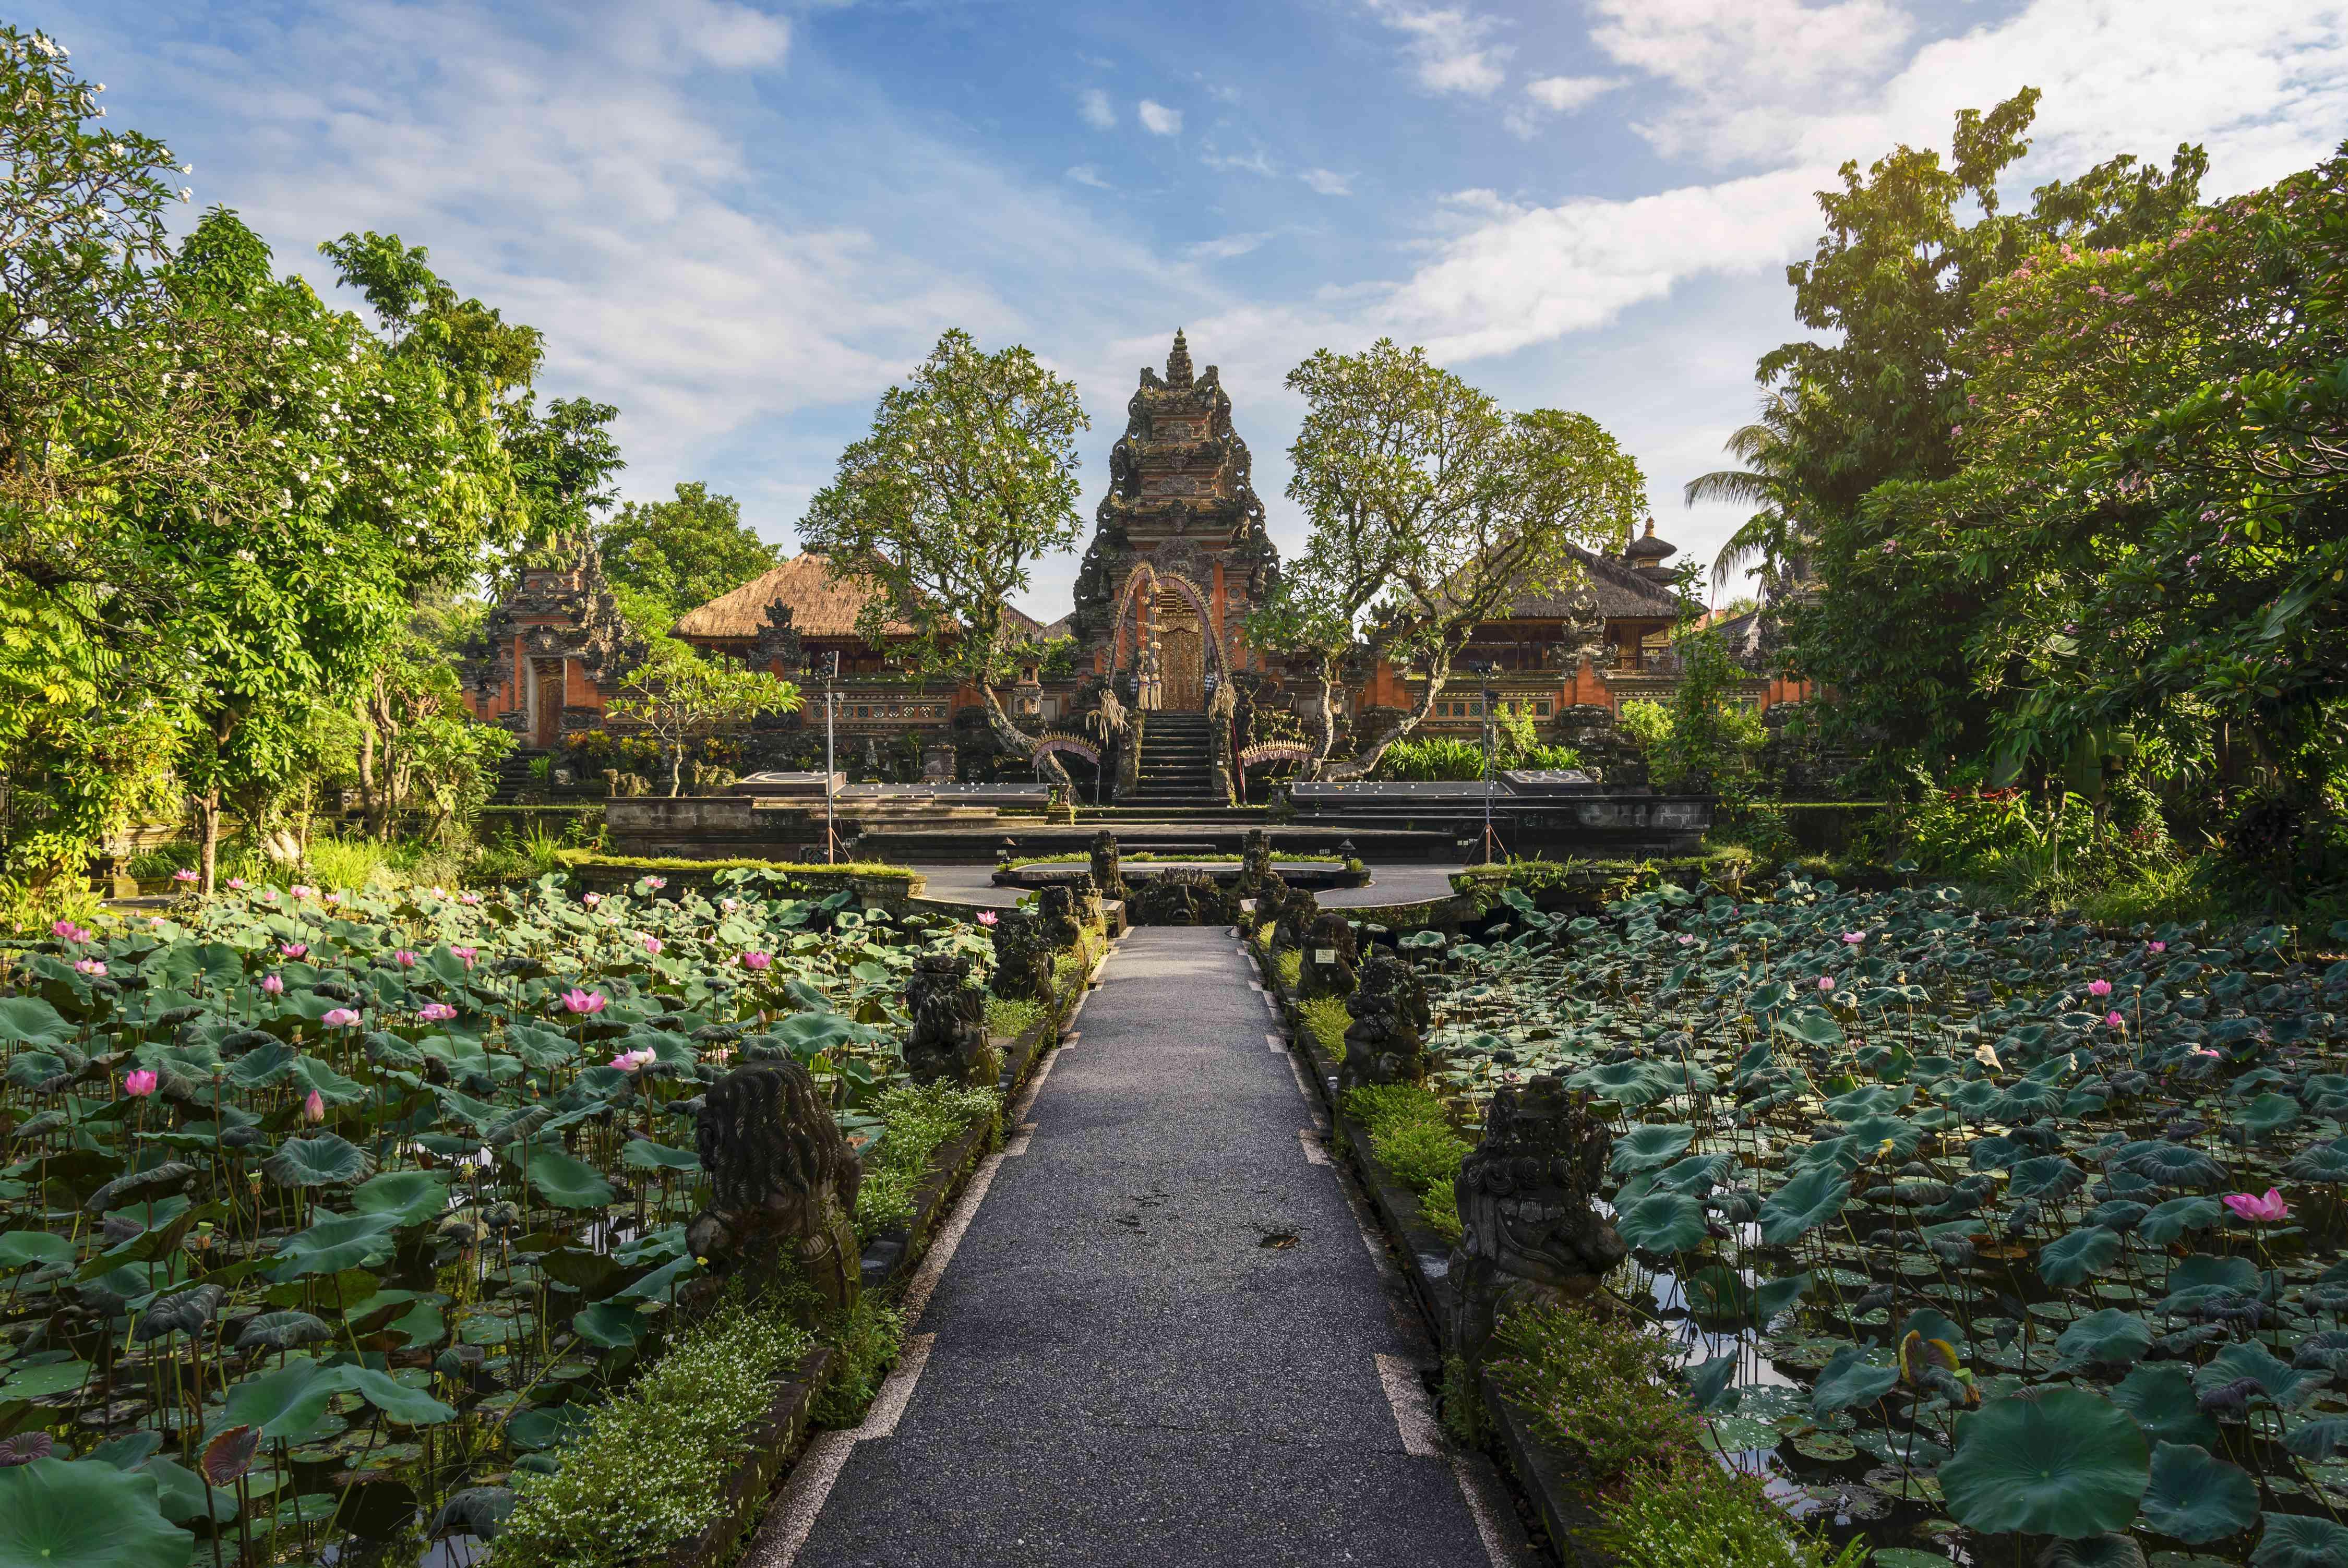 A temple in Ubud, Bali